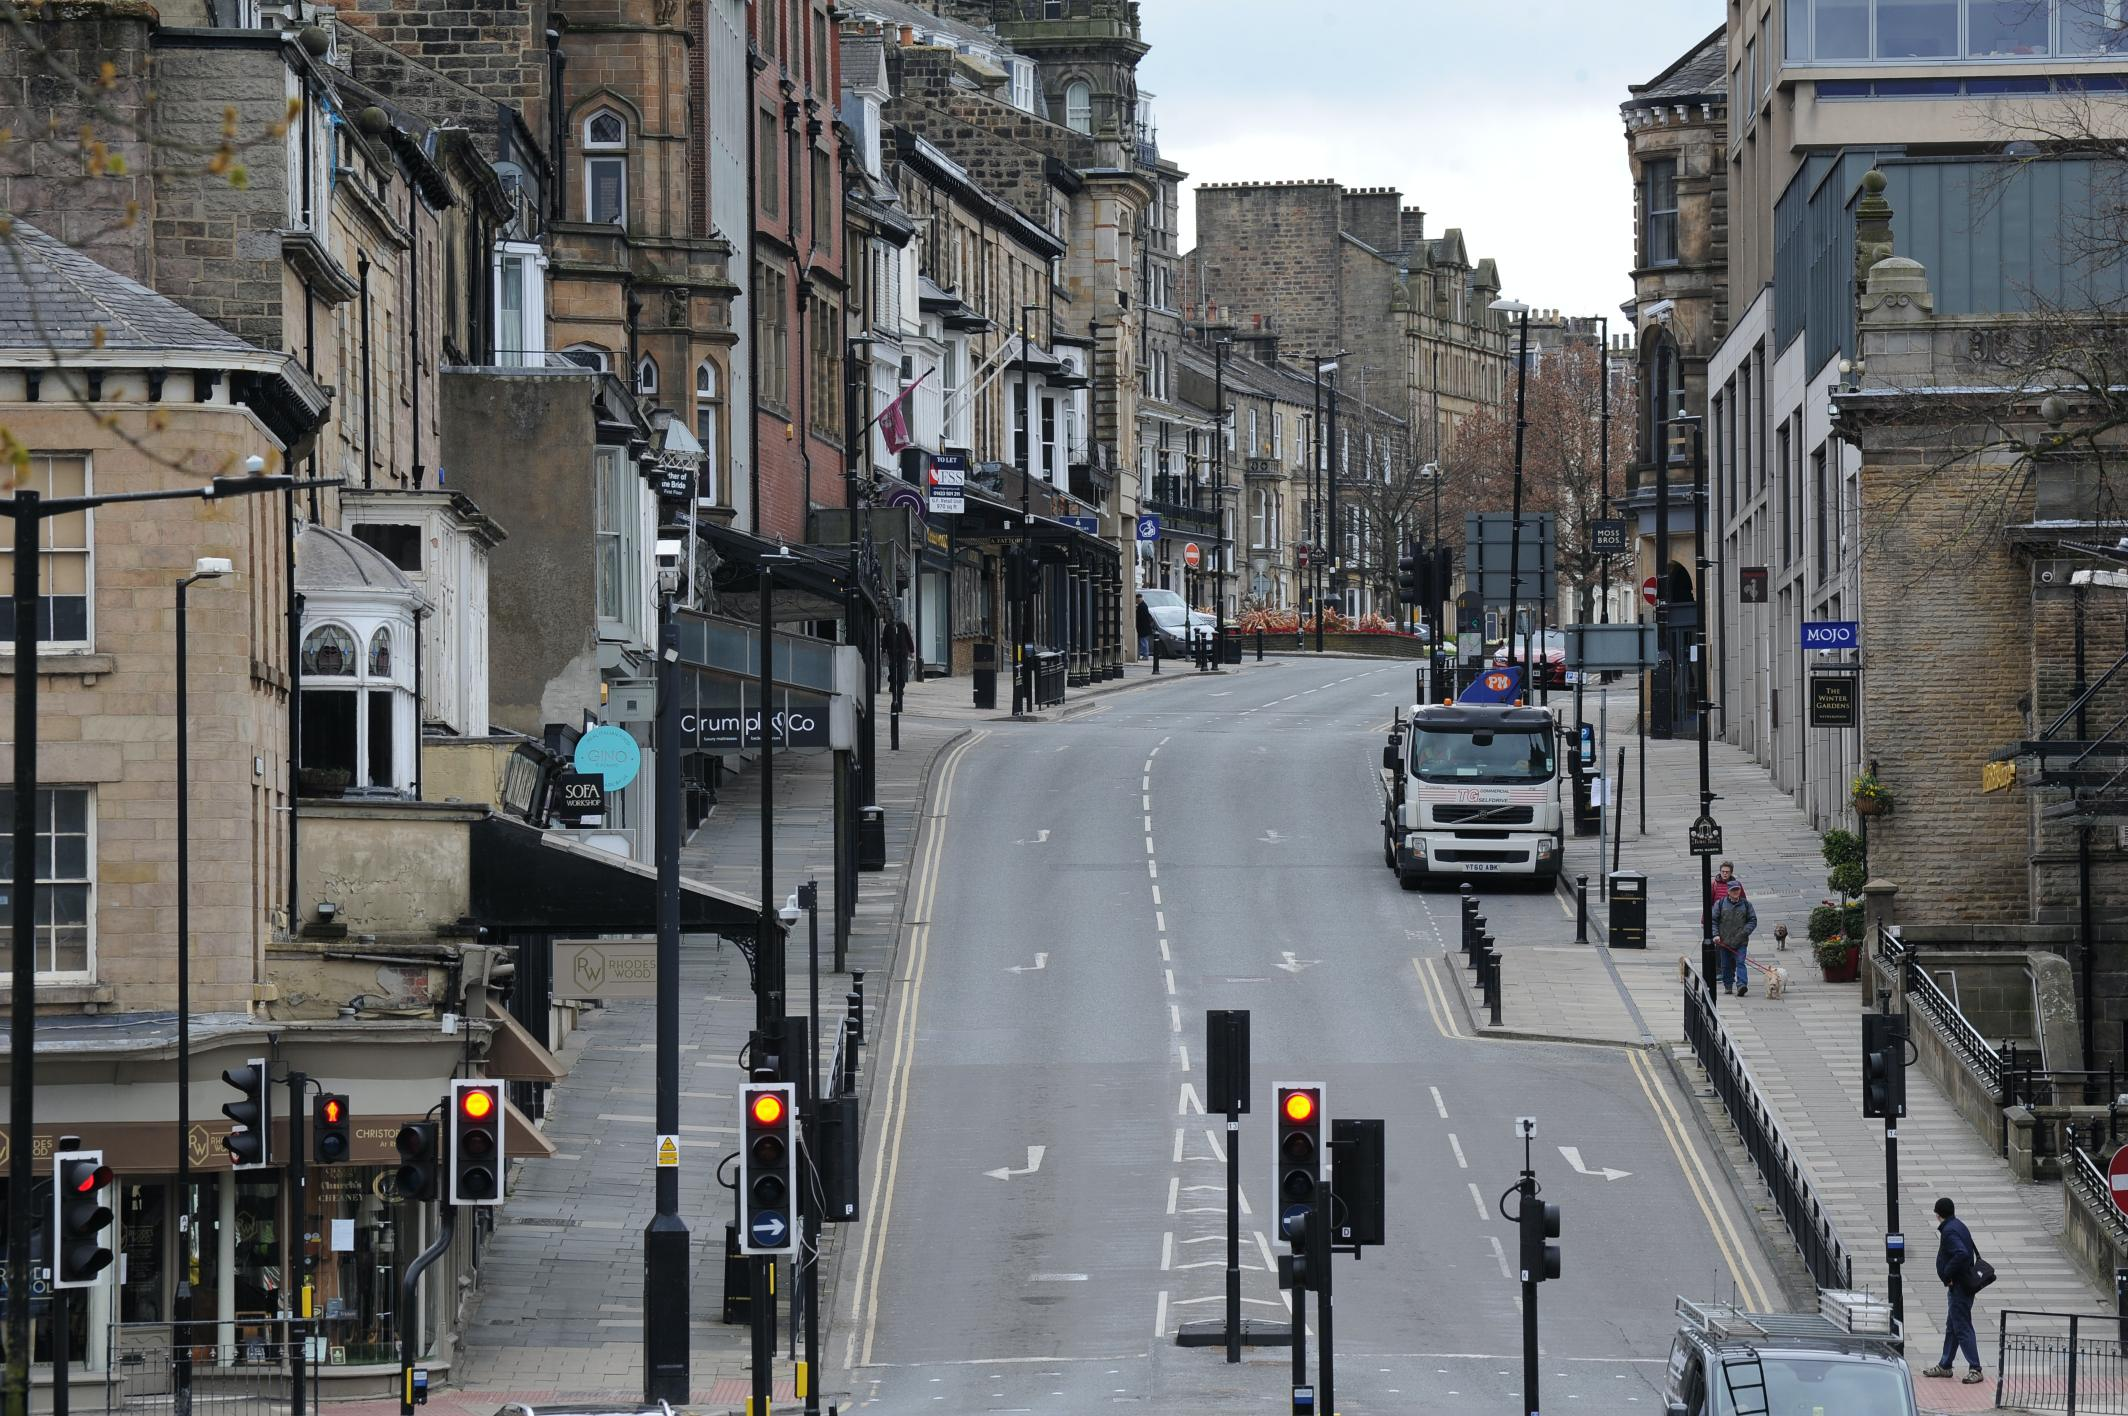 Parliament Street in Harrogate